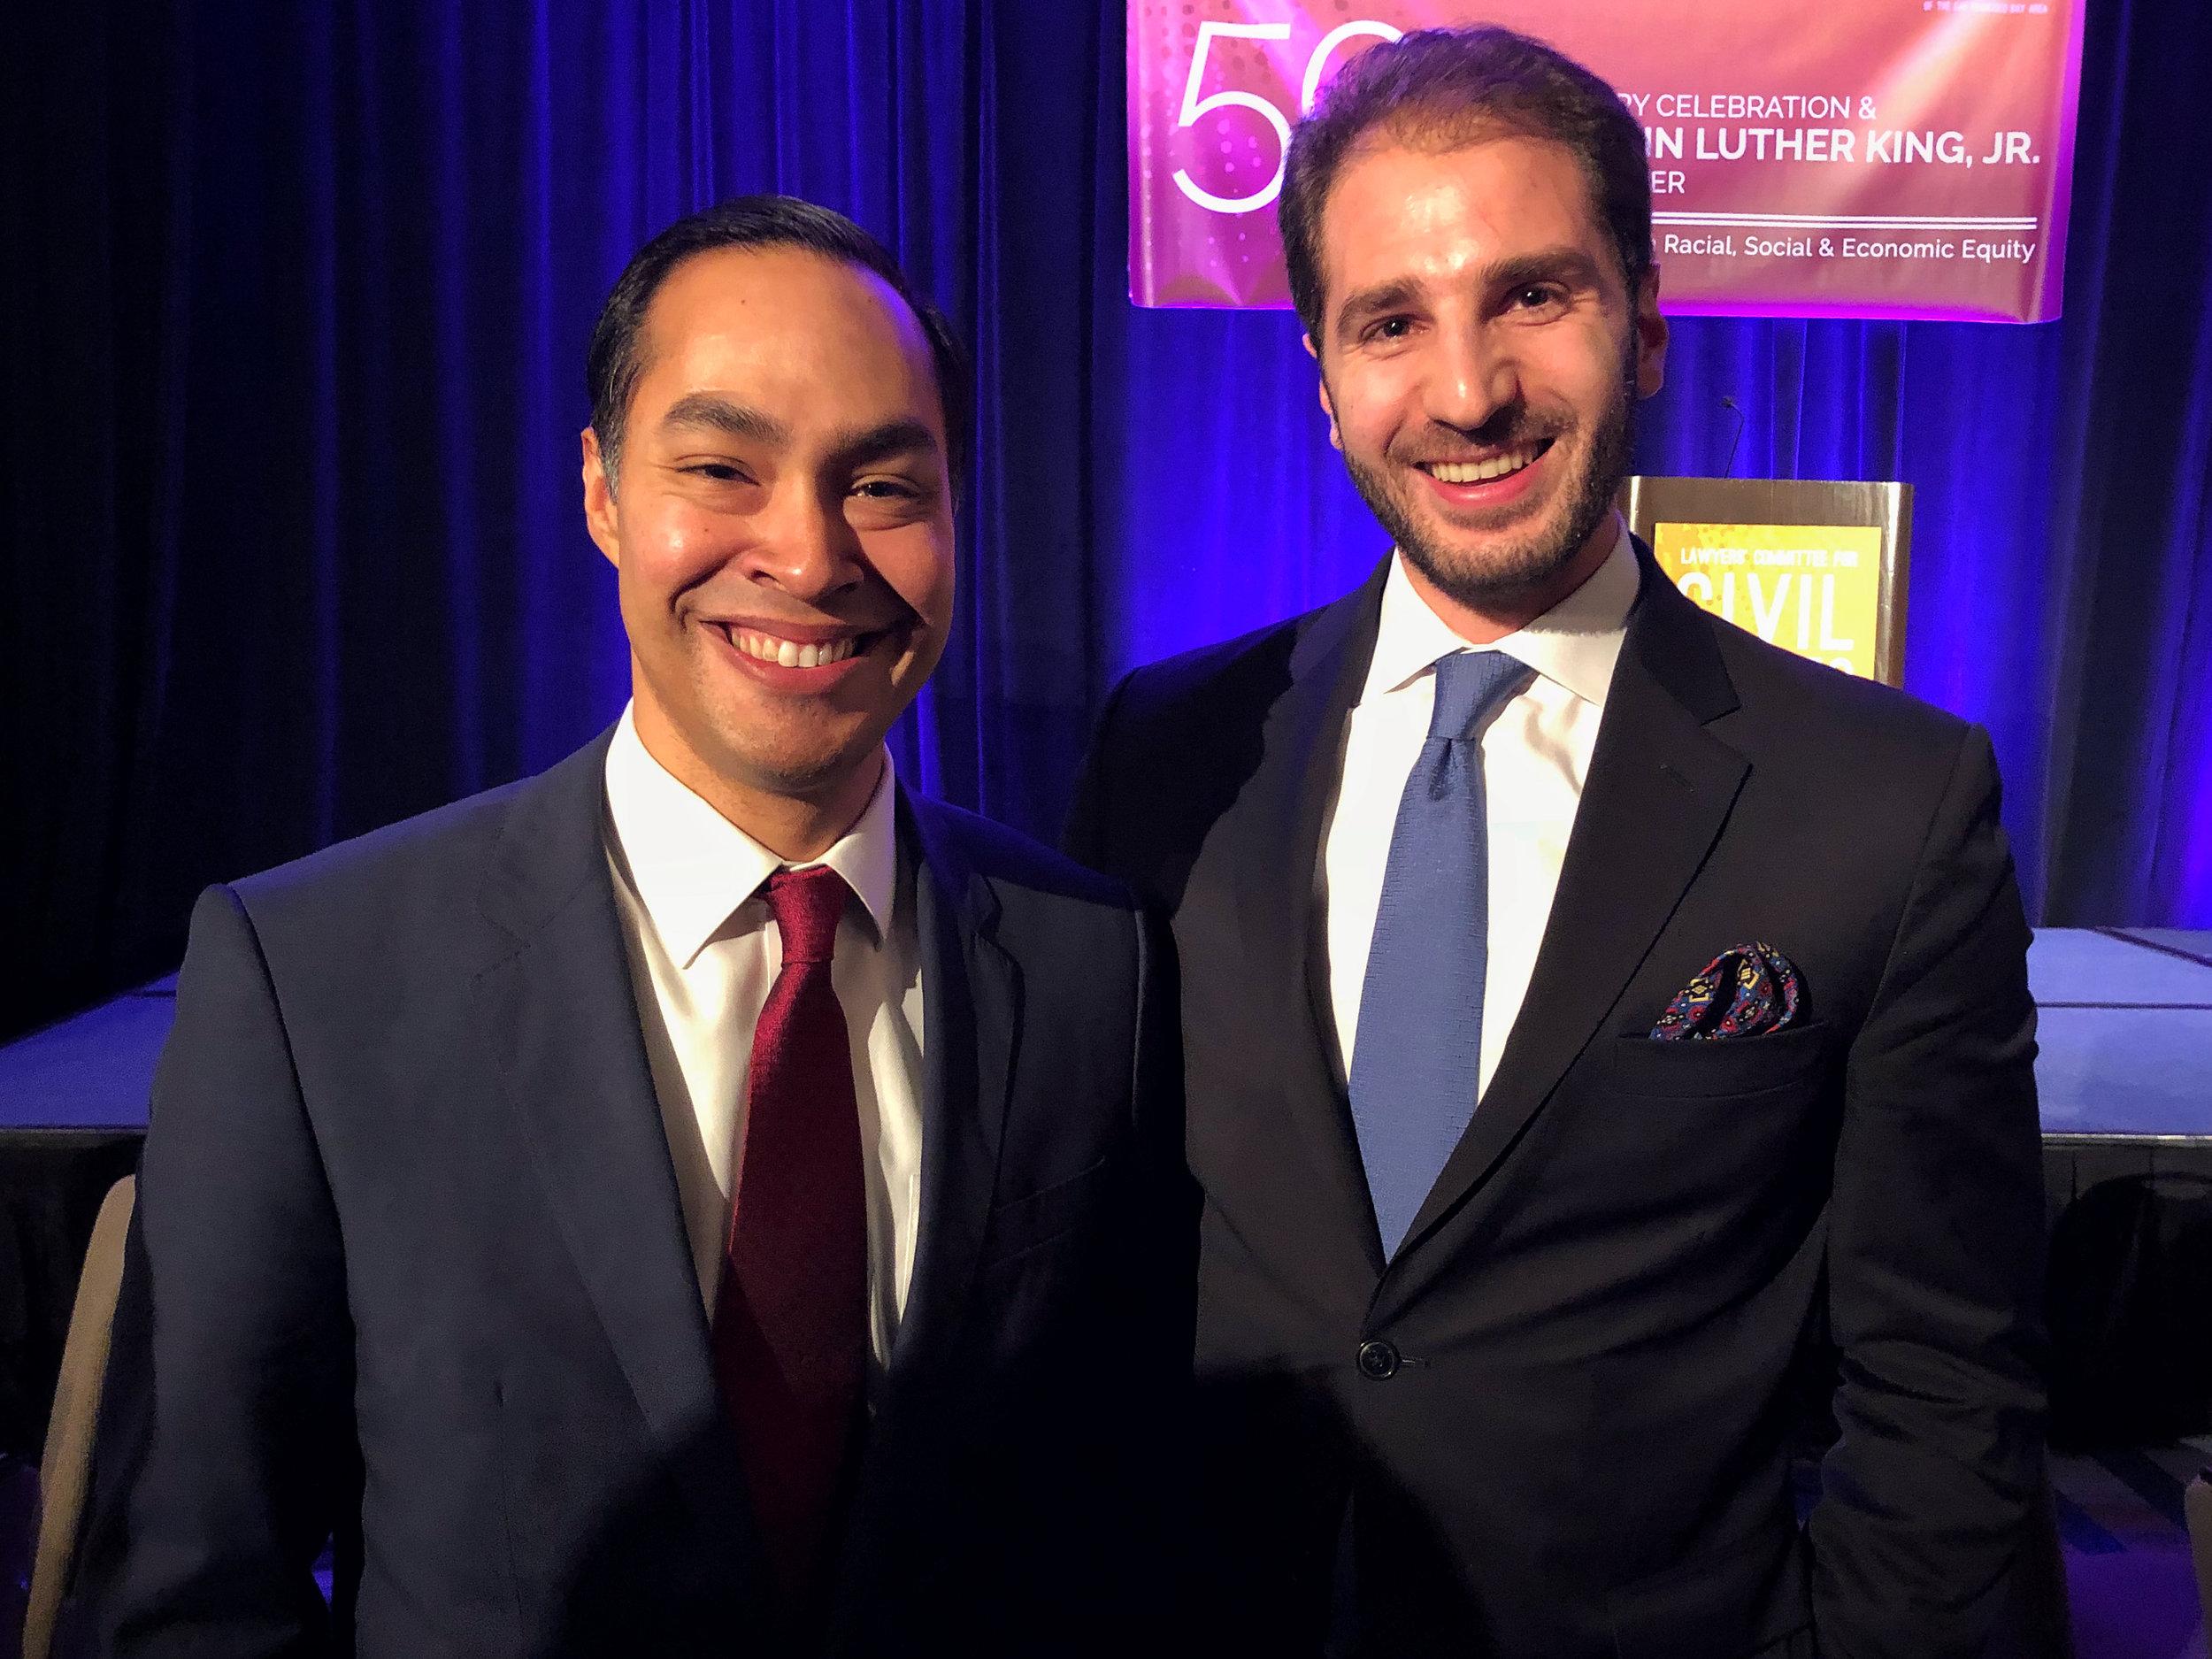 Paul Klimos & Julian Castro, US Secretary and Presidential Candidate